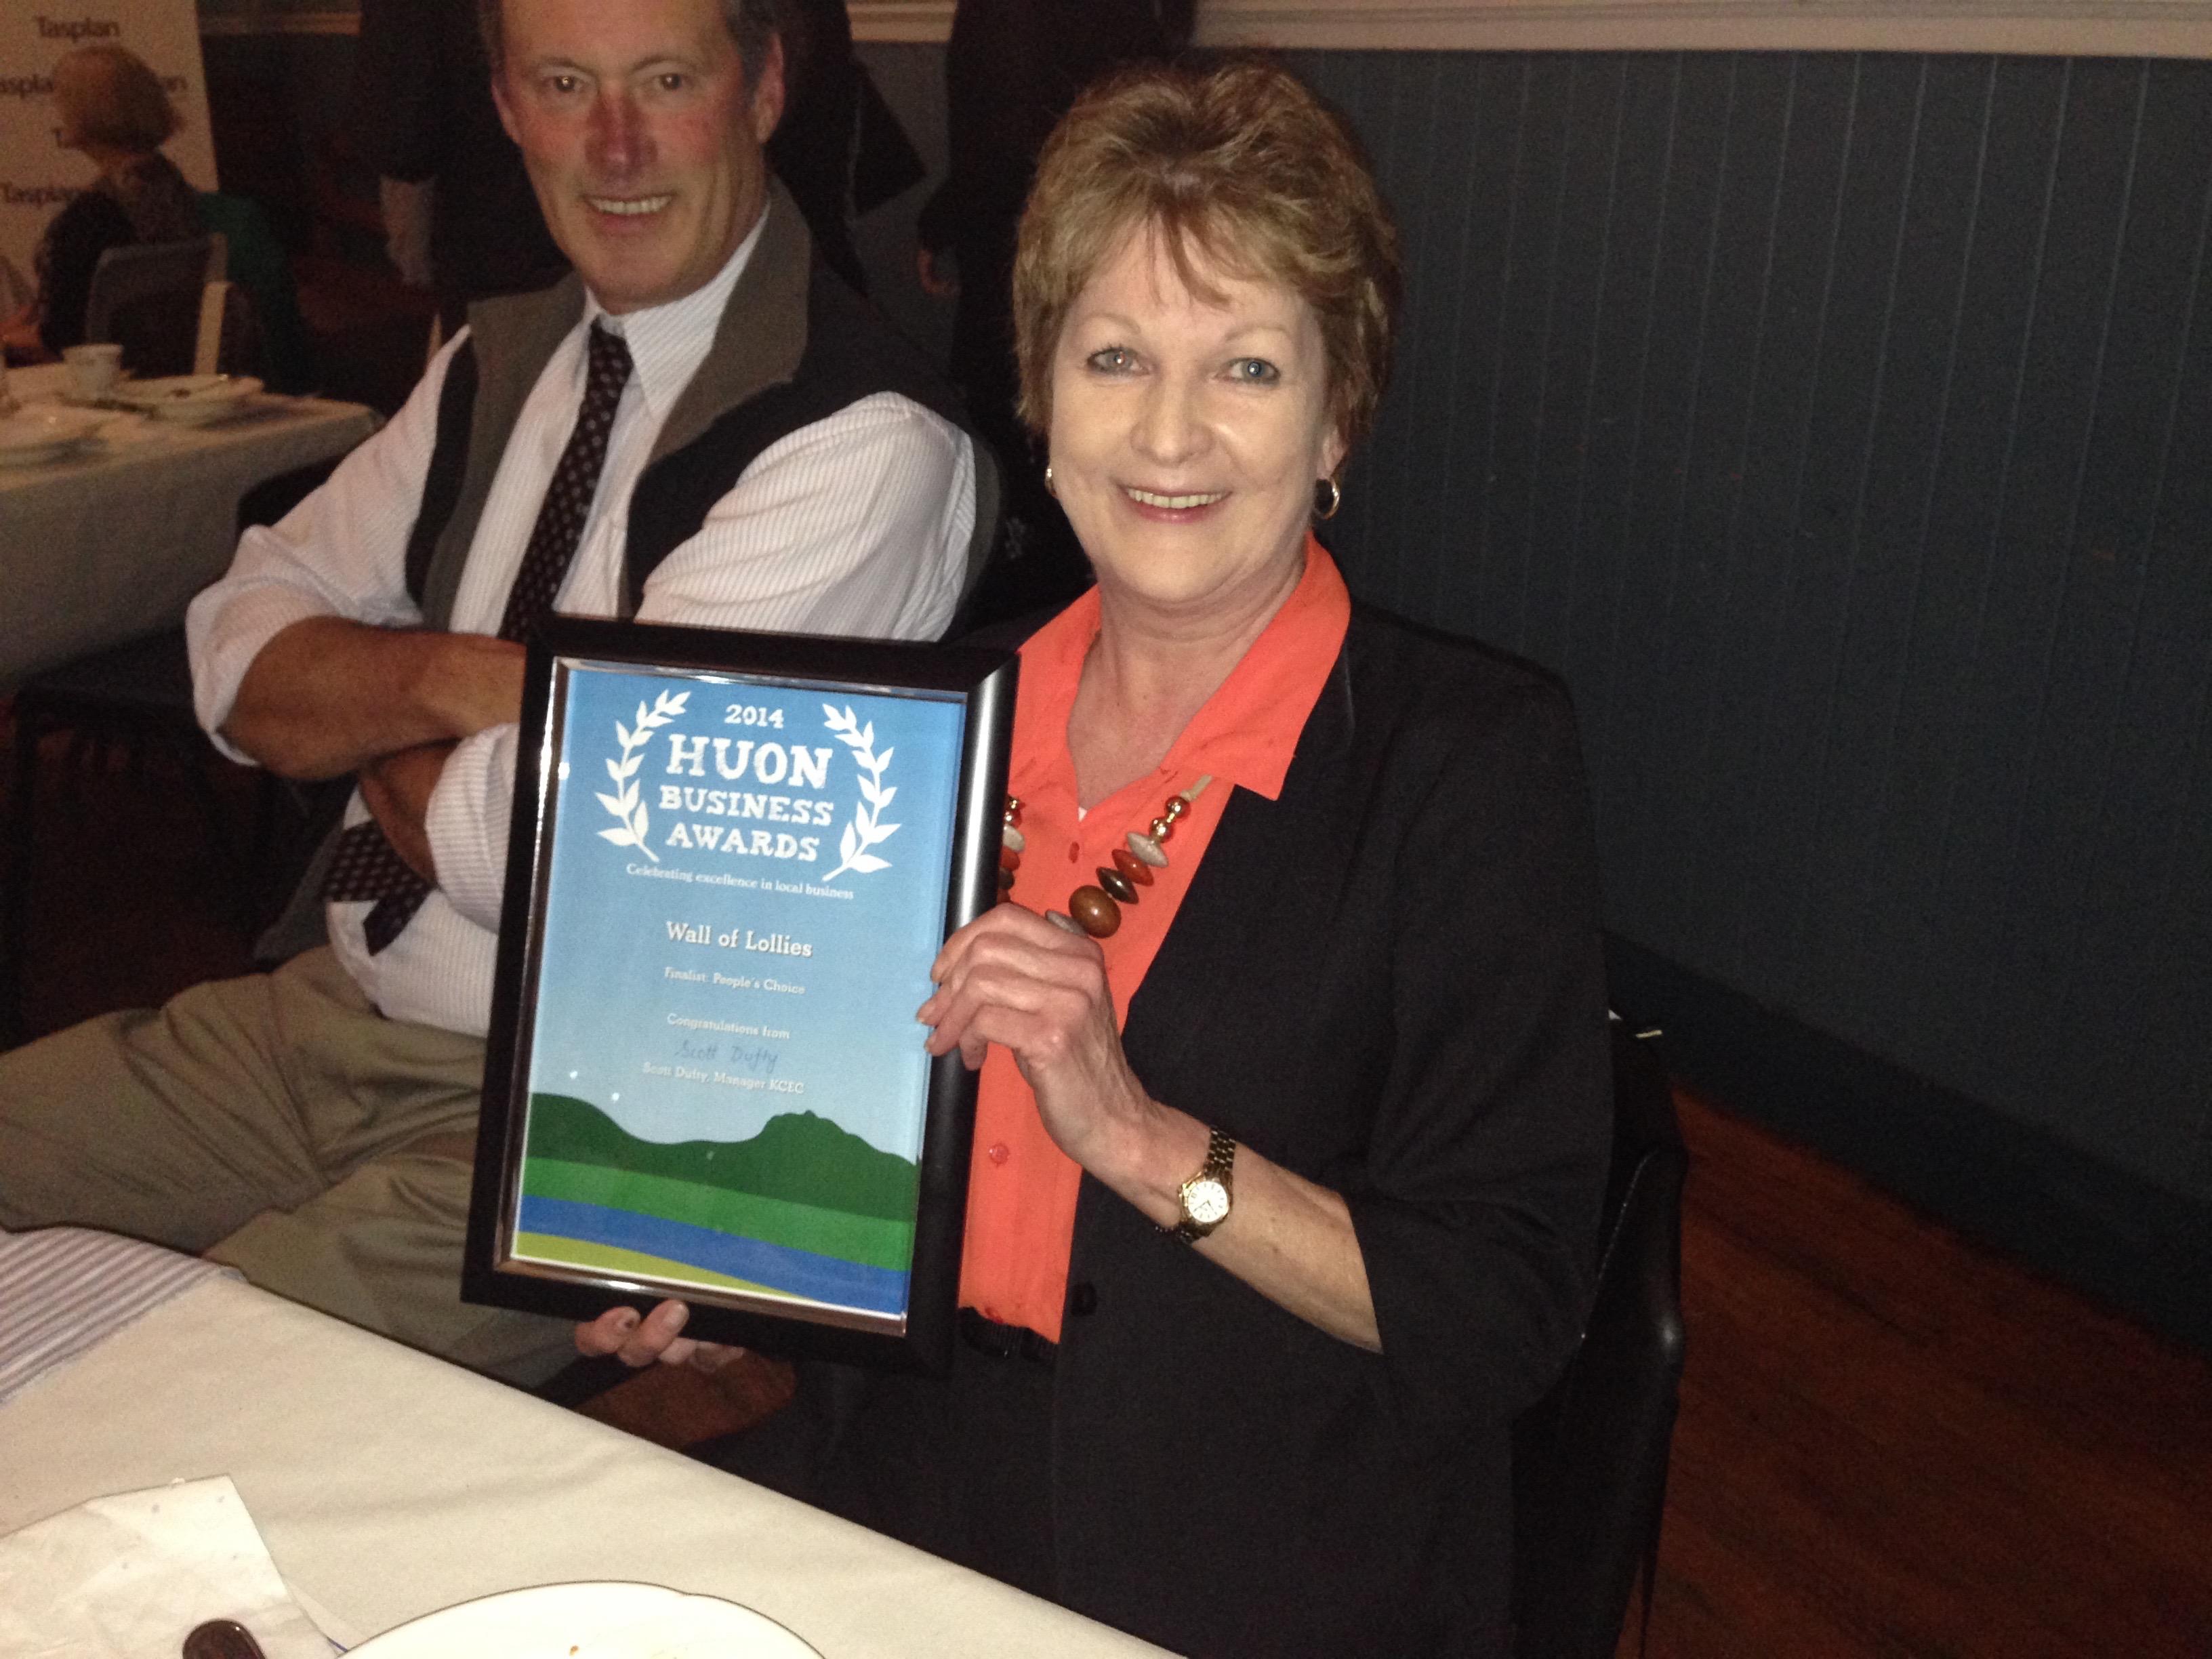 Award winning local business owner